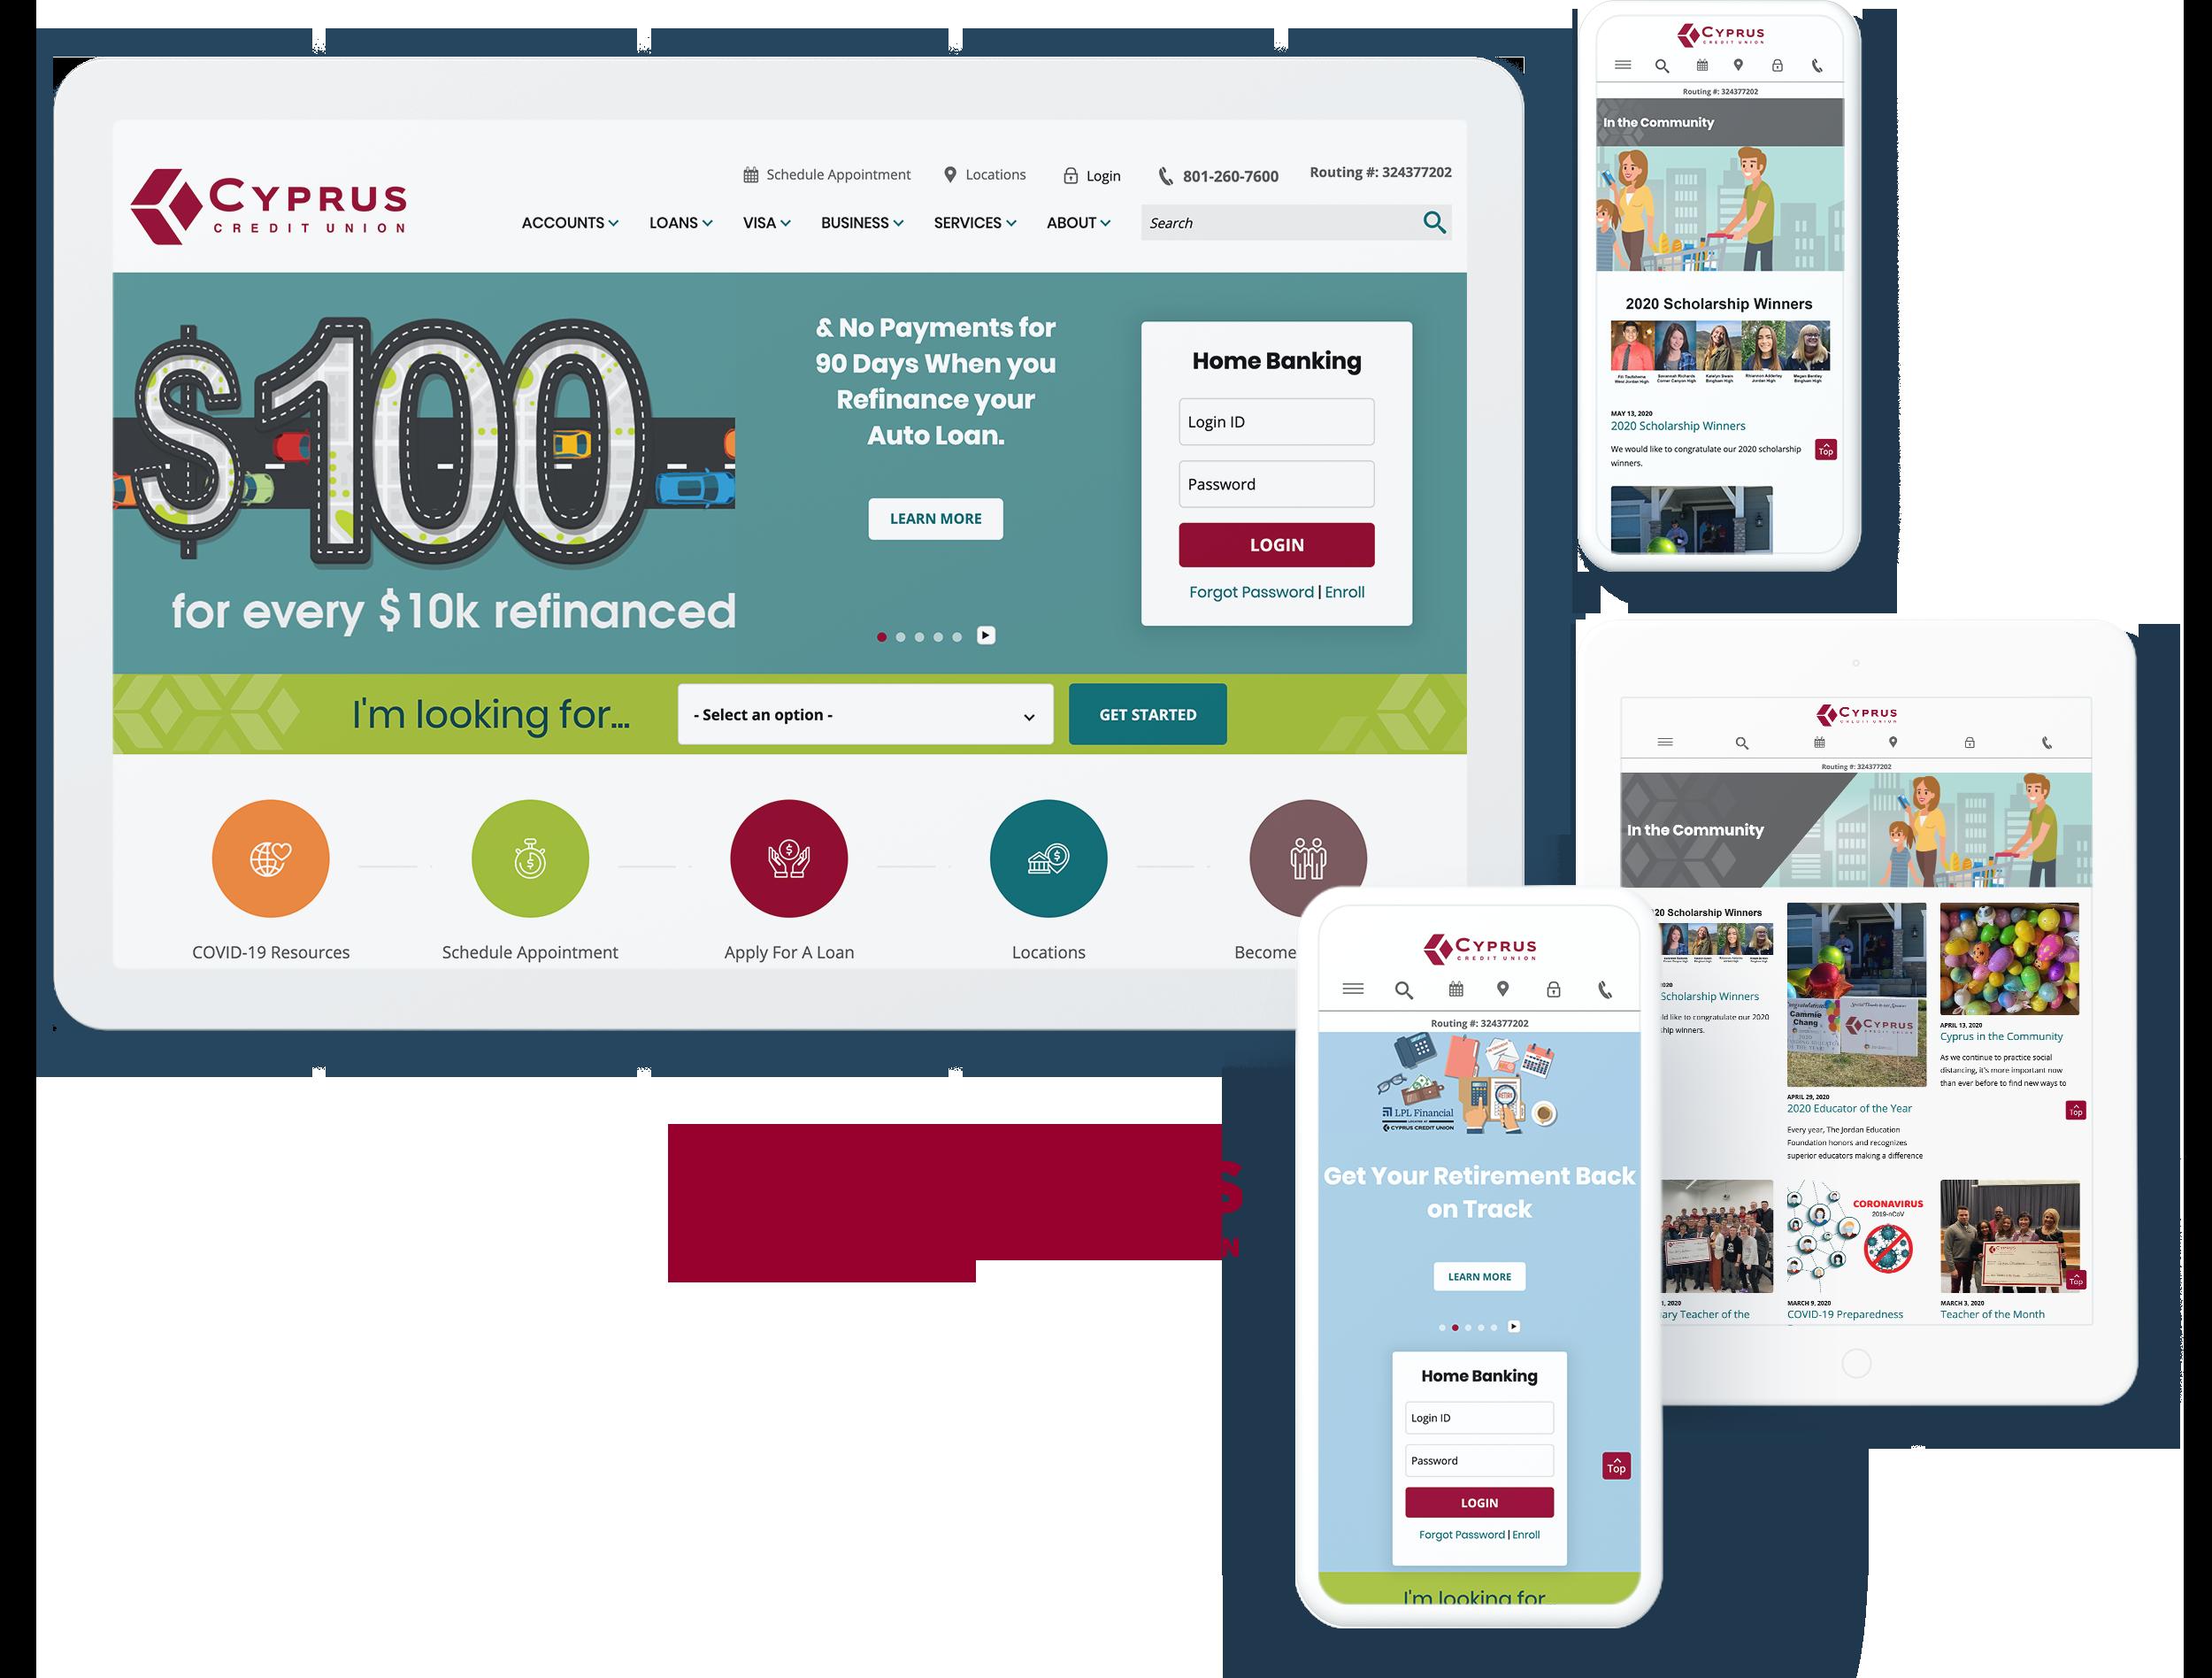 cyprus credit union spotlight